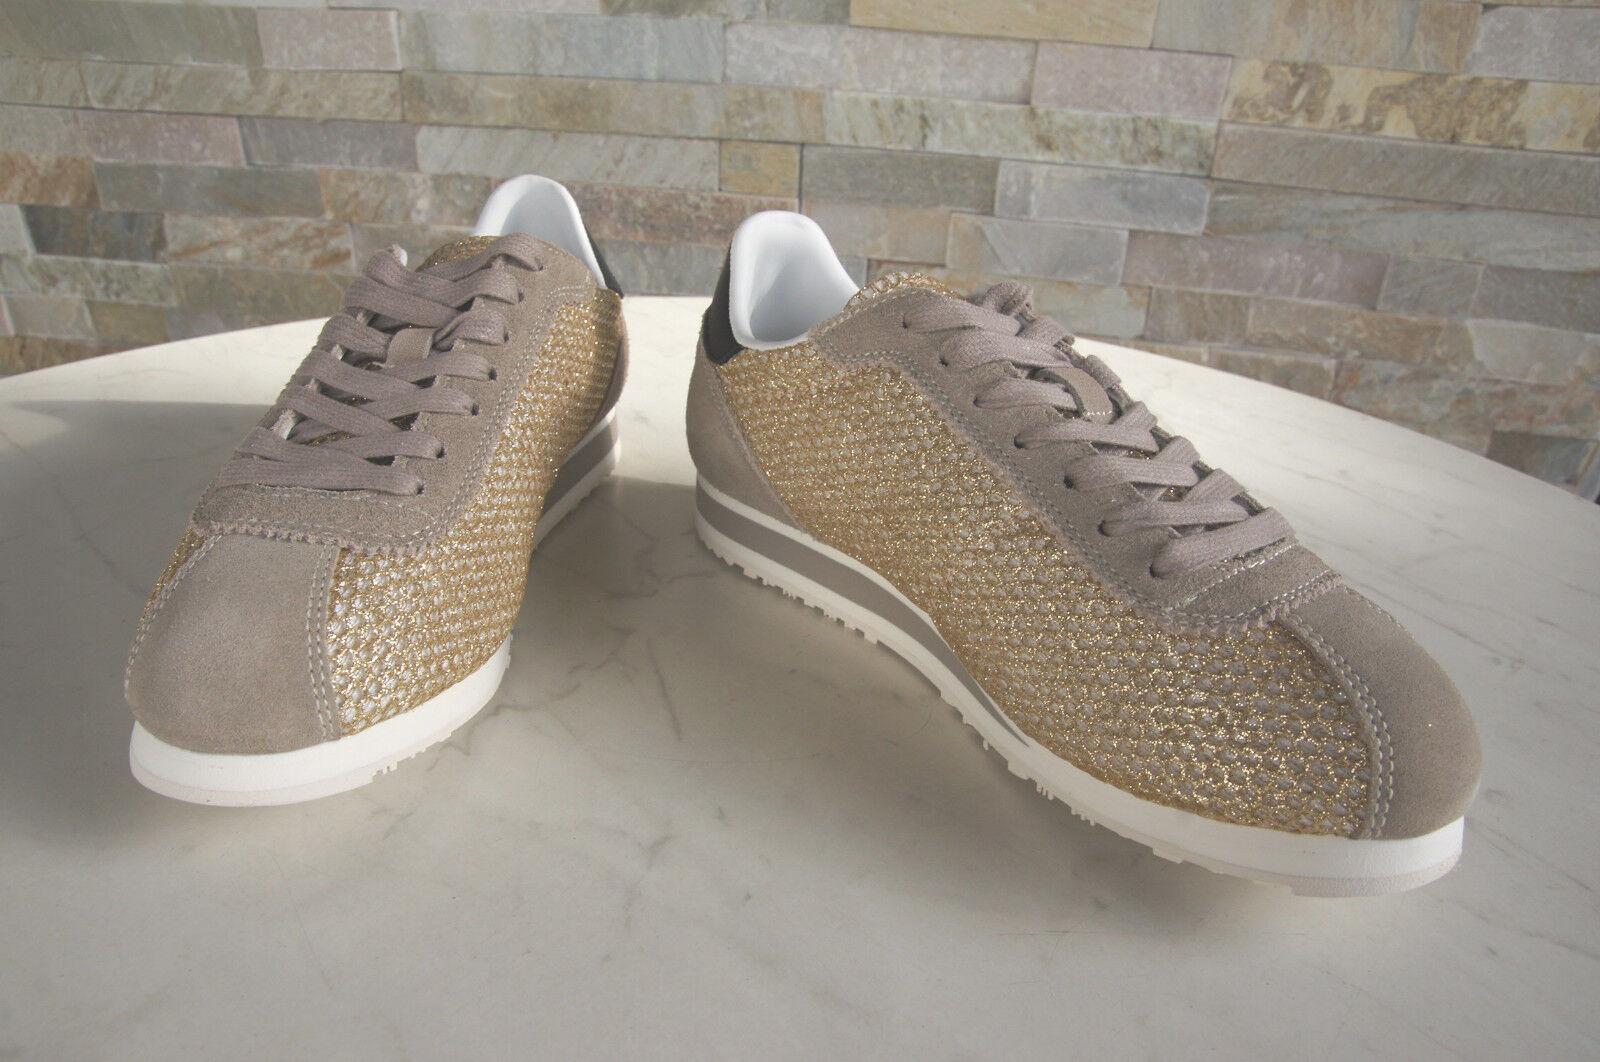 bluER USA 37 scarpe da ginnastica normalissime scarpe Bowling Beige Beige Beige oro Nuovo ex UVP bb6e3c